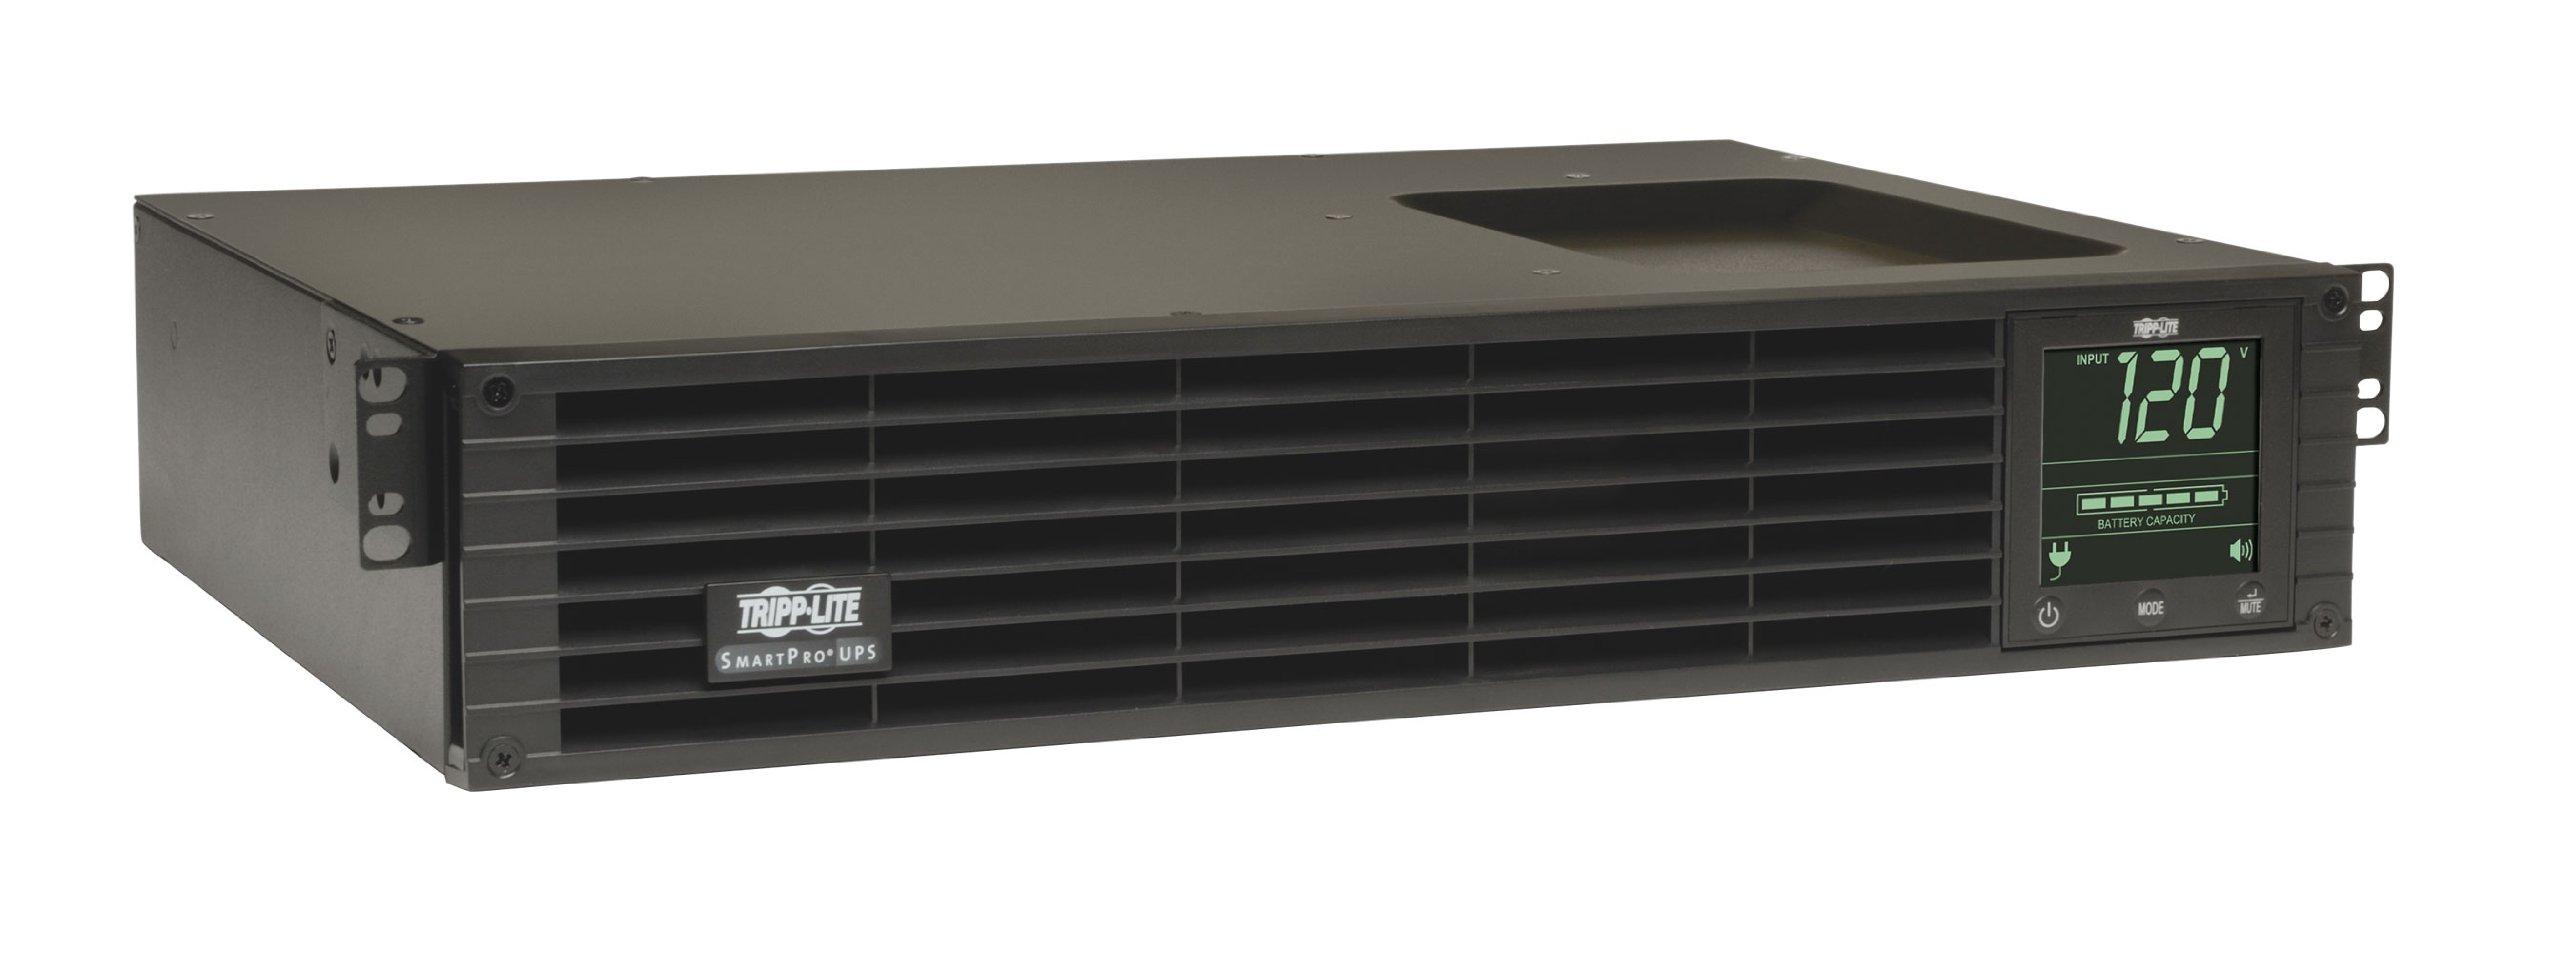 Tripp Lite 1500VA Smart UPS Back Up, Sine Wave, 1350W Line-Interactive, SNMP Card, 2U Rackmount, LCD, USB, DB9 (SMART1500RM2UN) by Tripp Lite